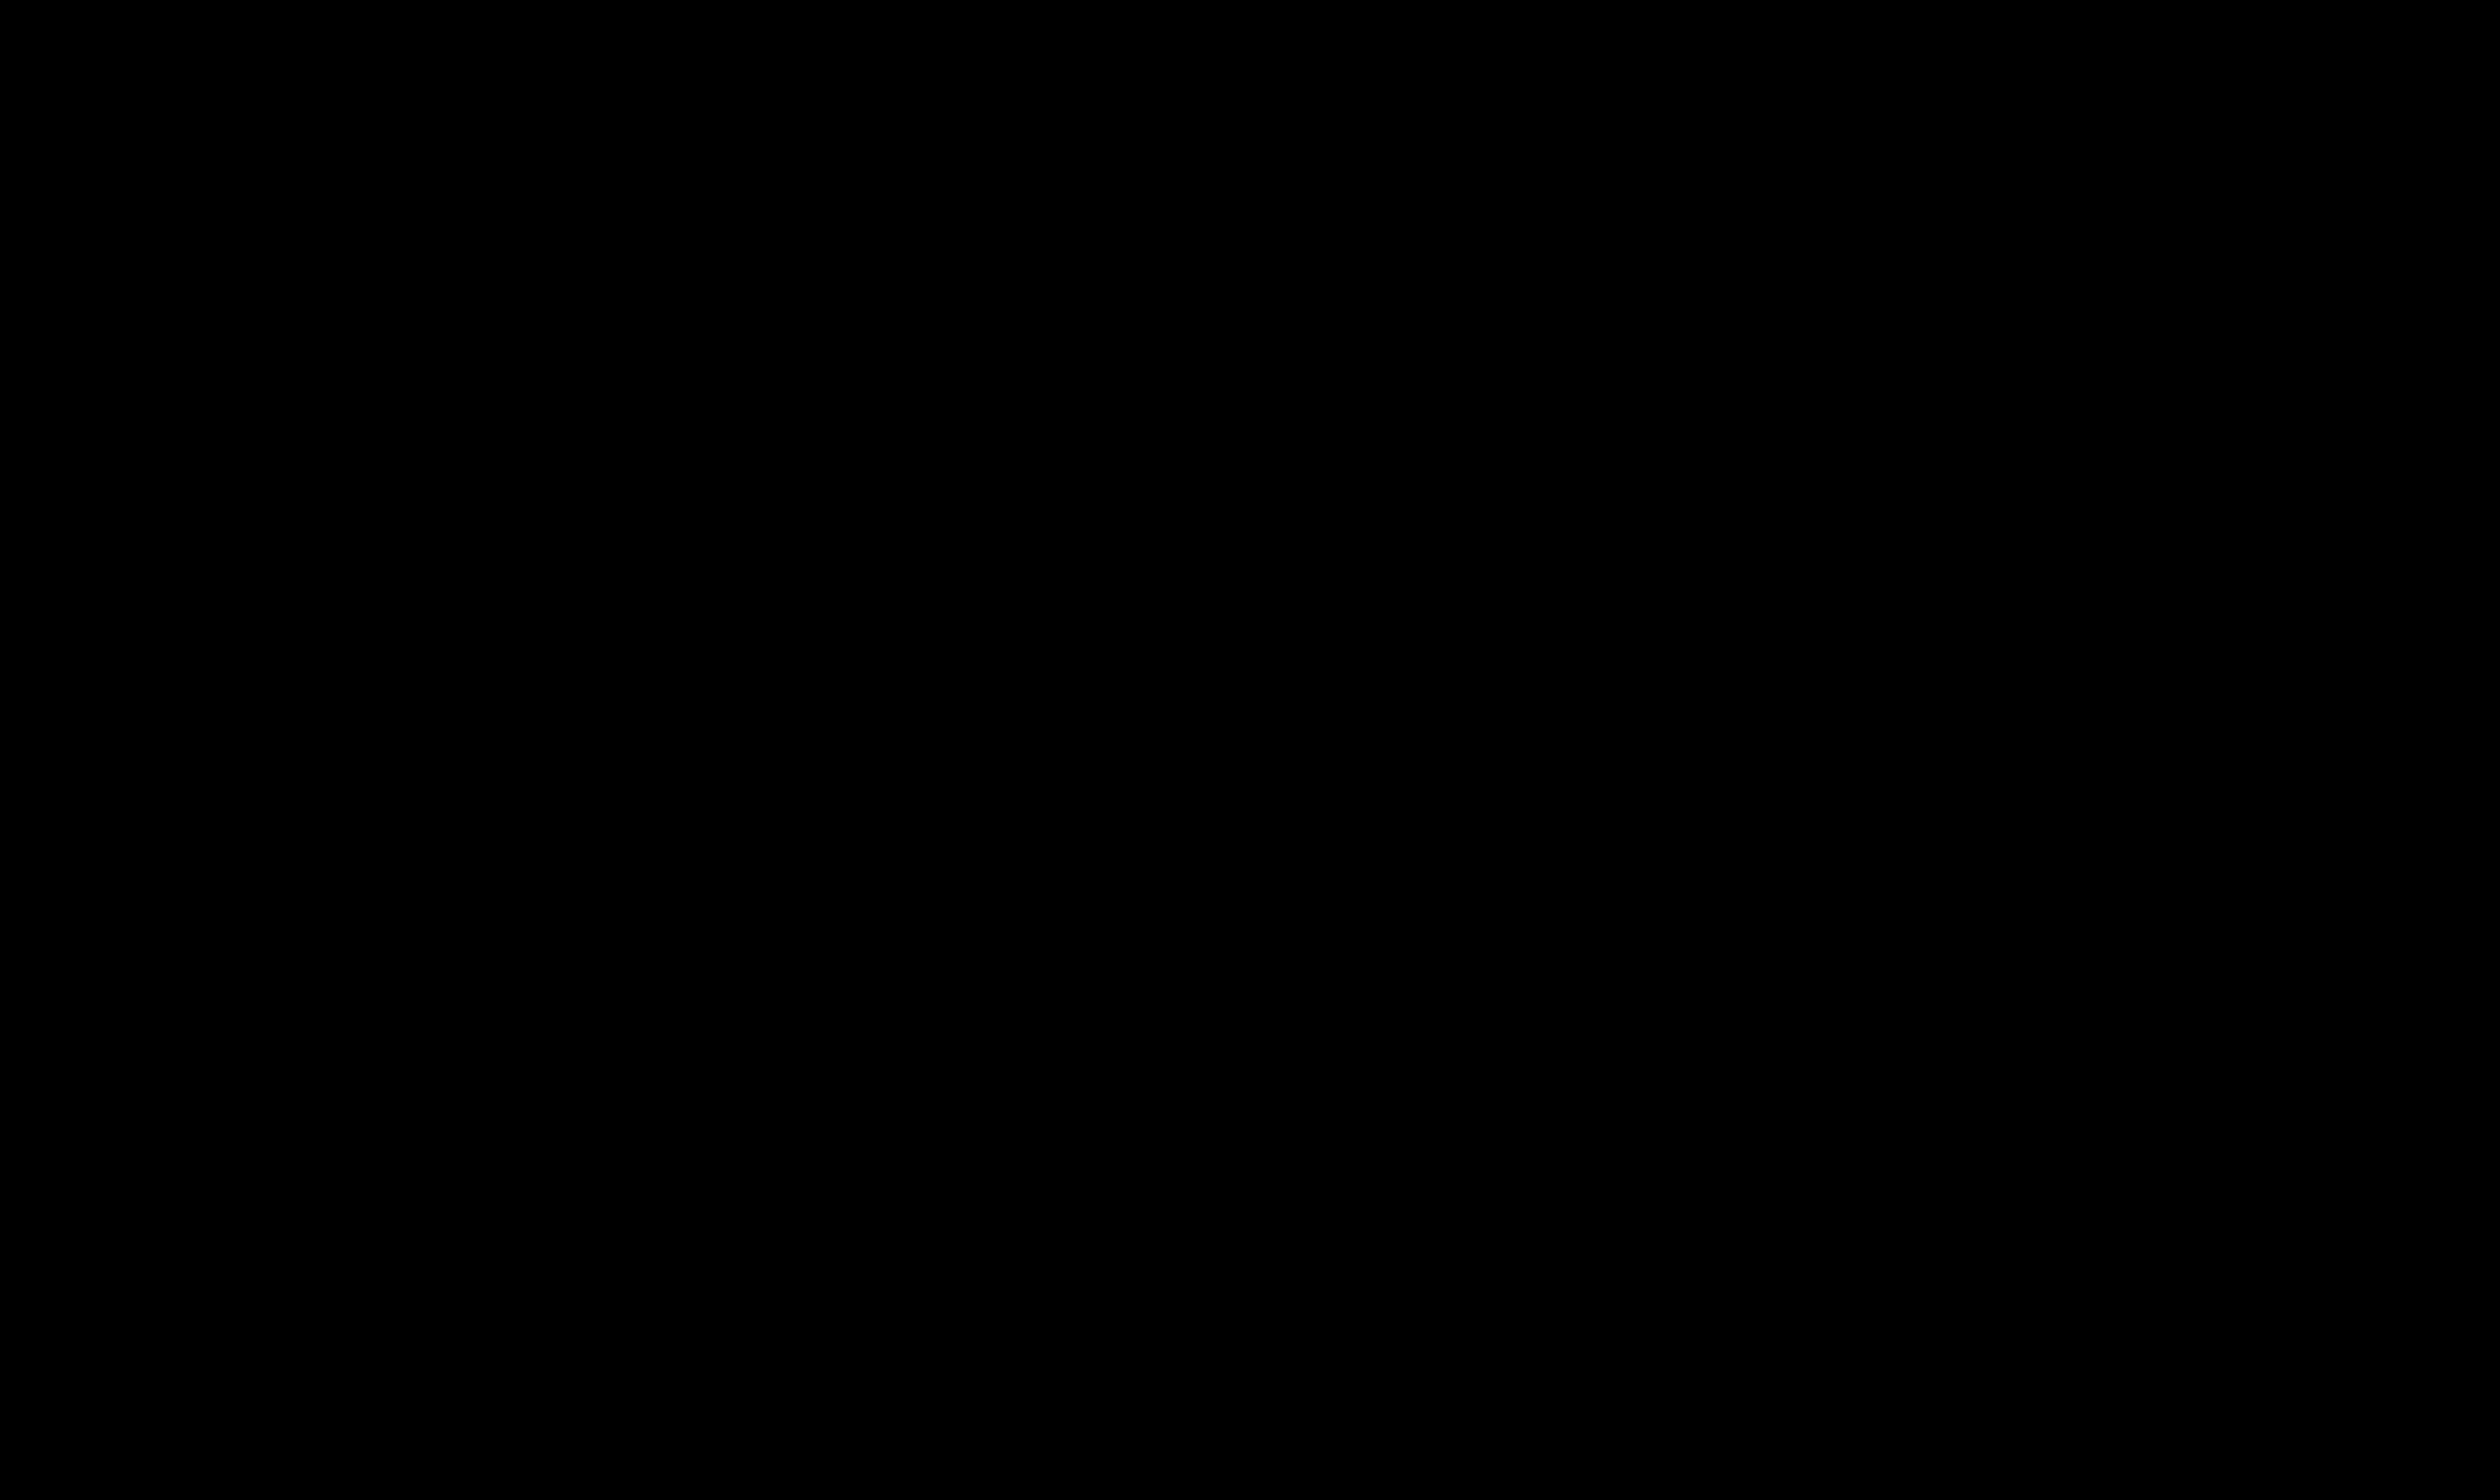 DBCO-dPEG®₂₄-amido-dPEG®₂₄-DSPE